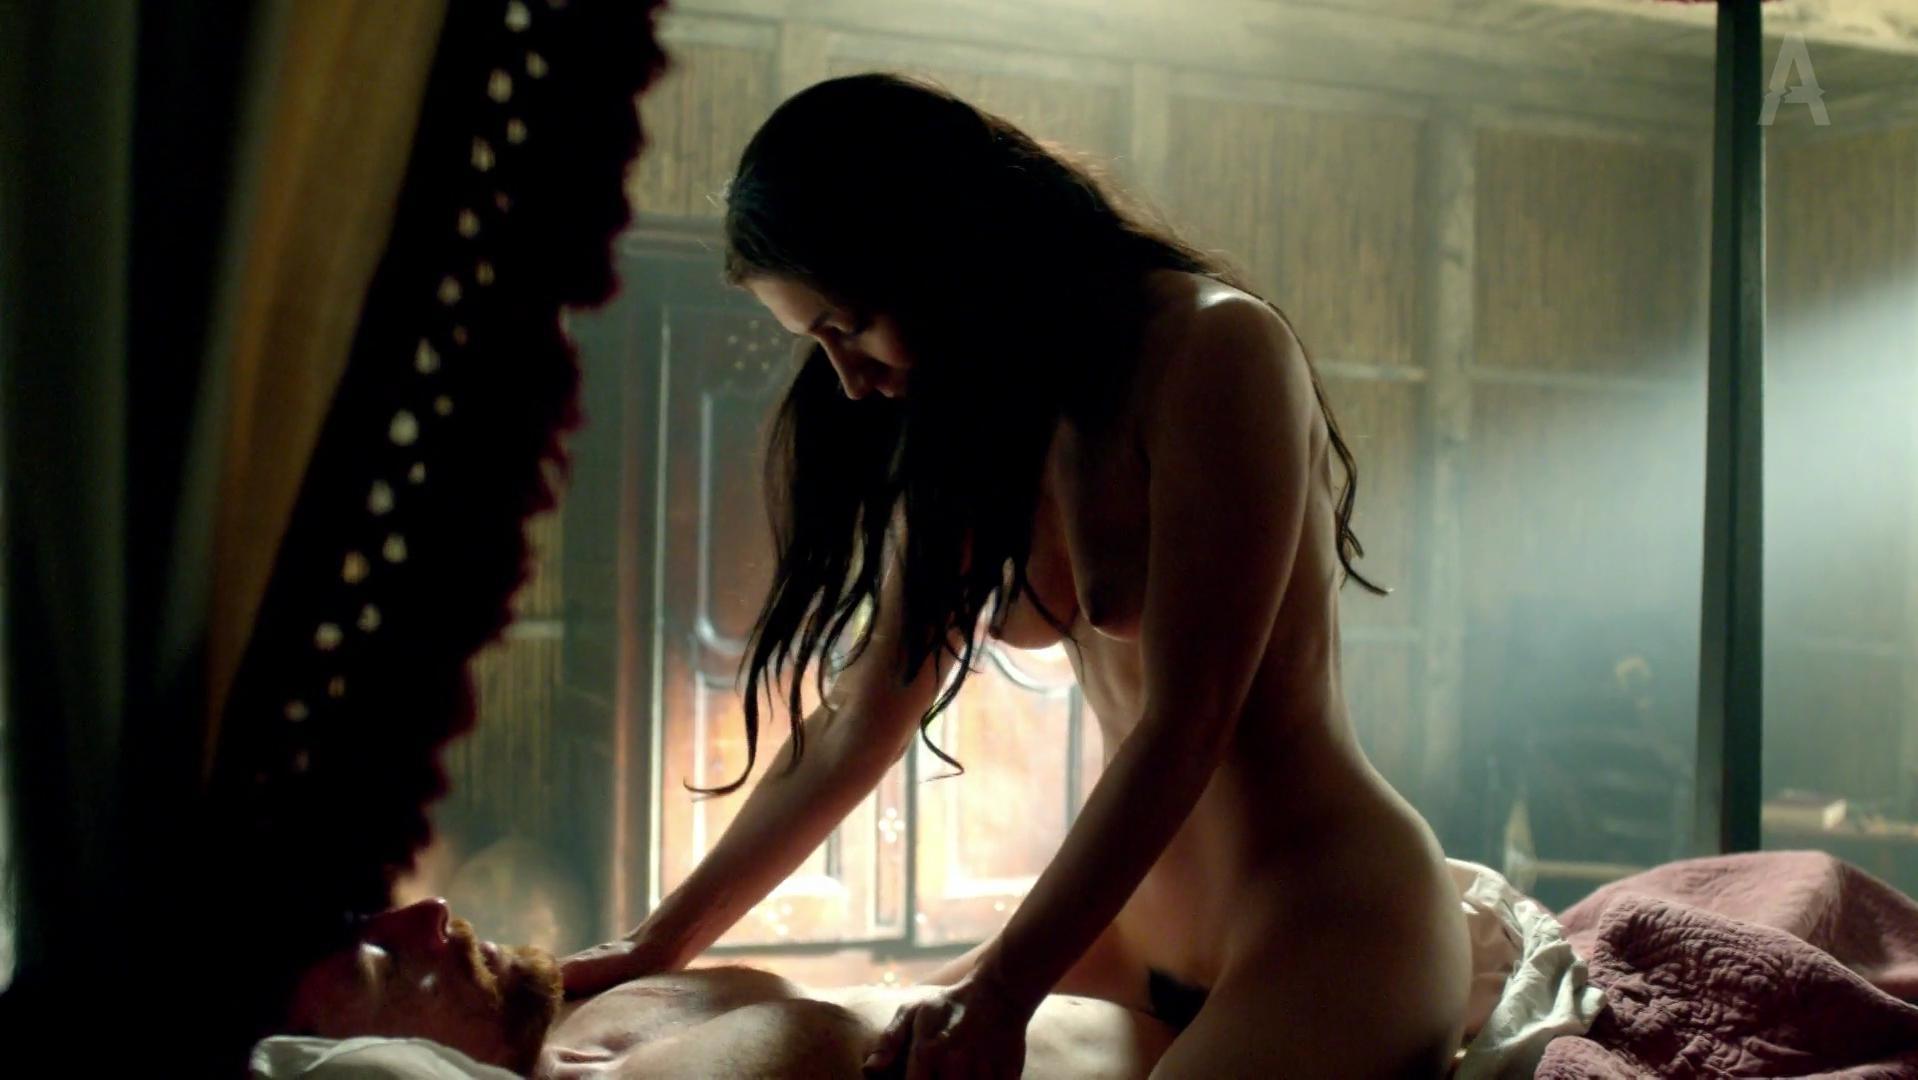 Louise Barnes nude, Jessica Parker Kennedy sexy - Black Sails s01e04 (2014)